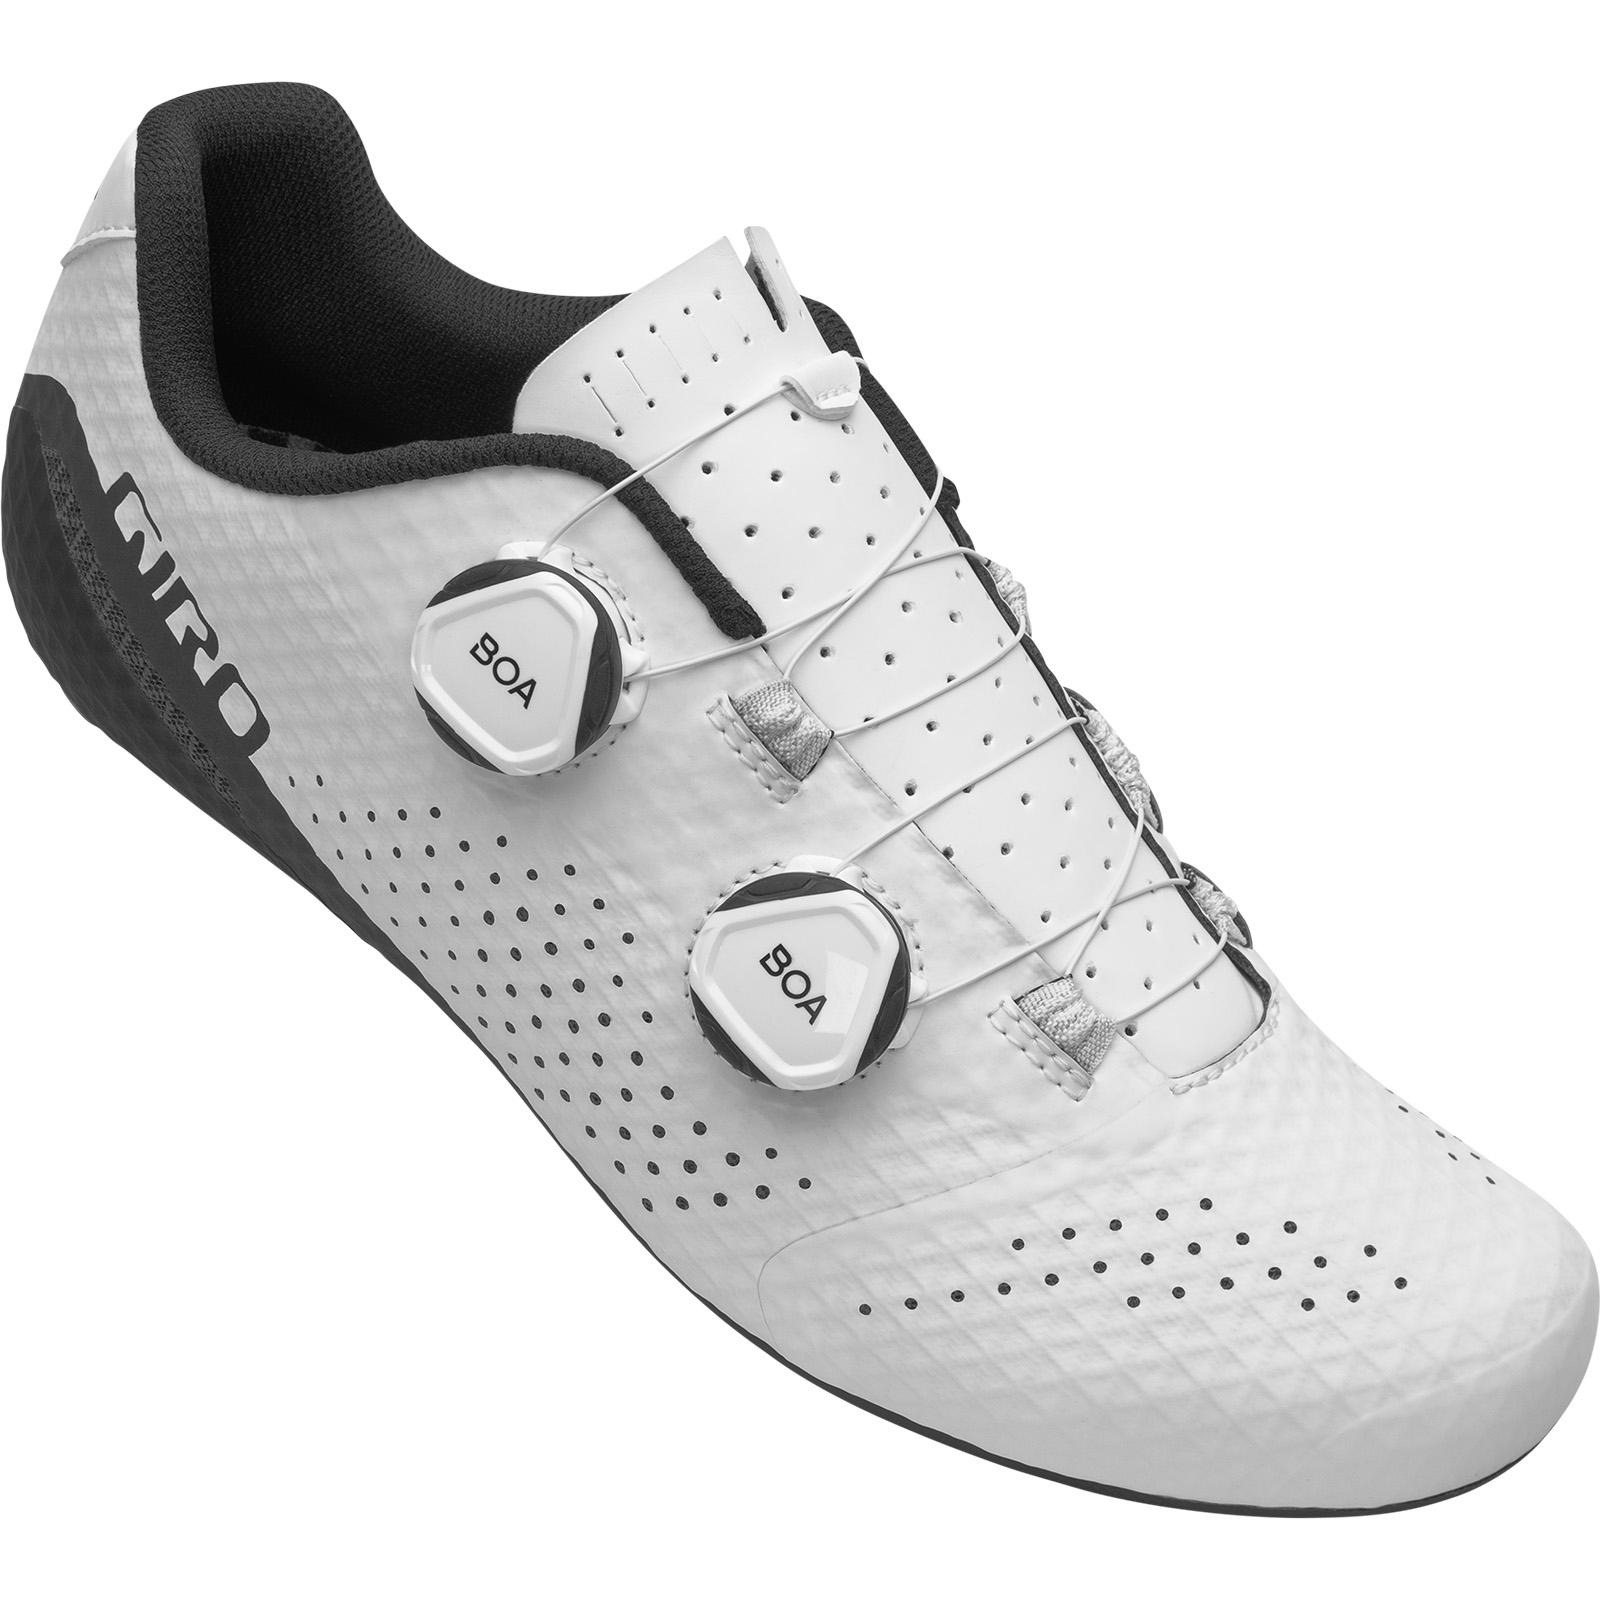 Picture of Giro Regime Road Shoe - white